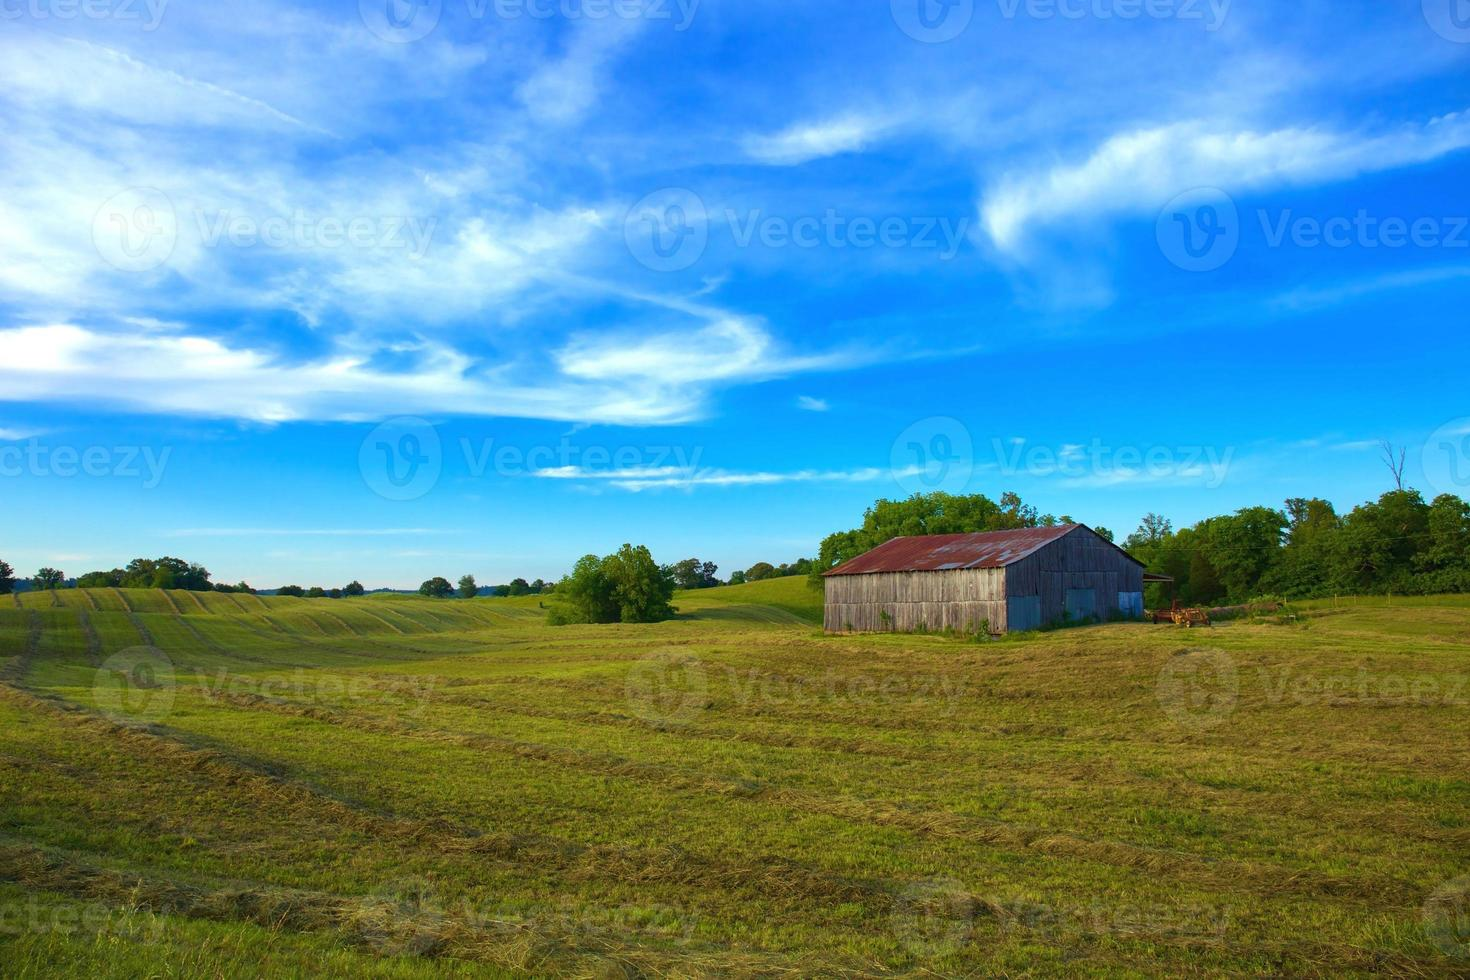 Ackerland mit Feld foto